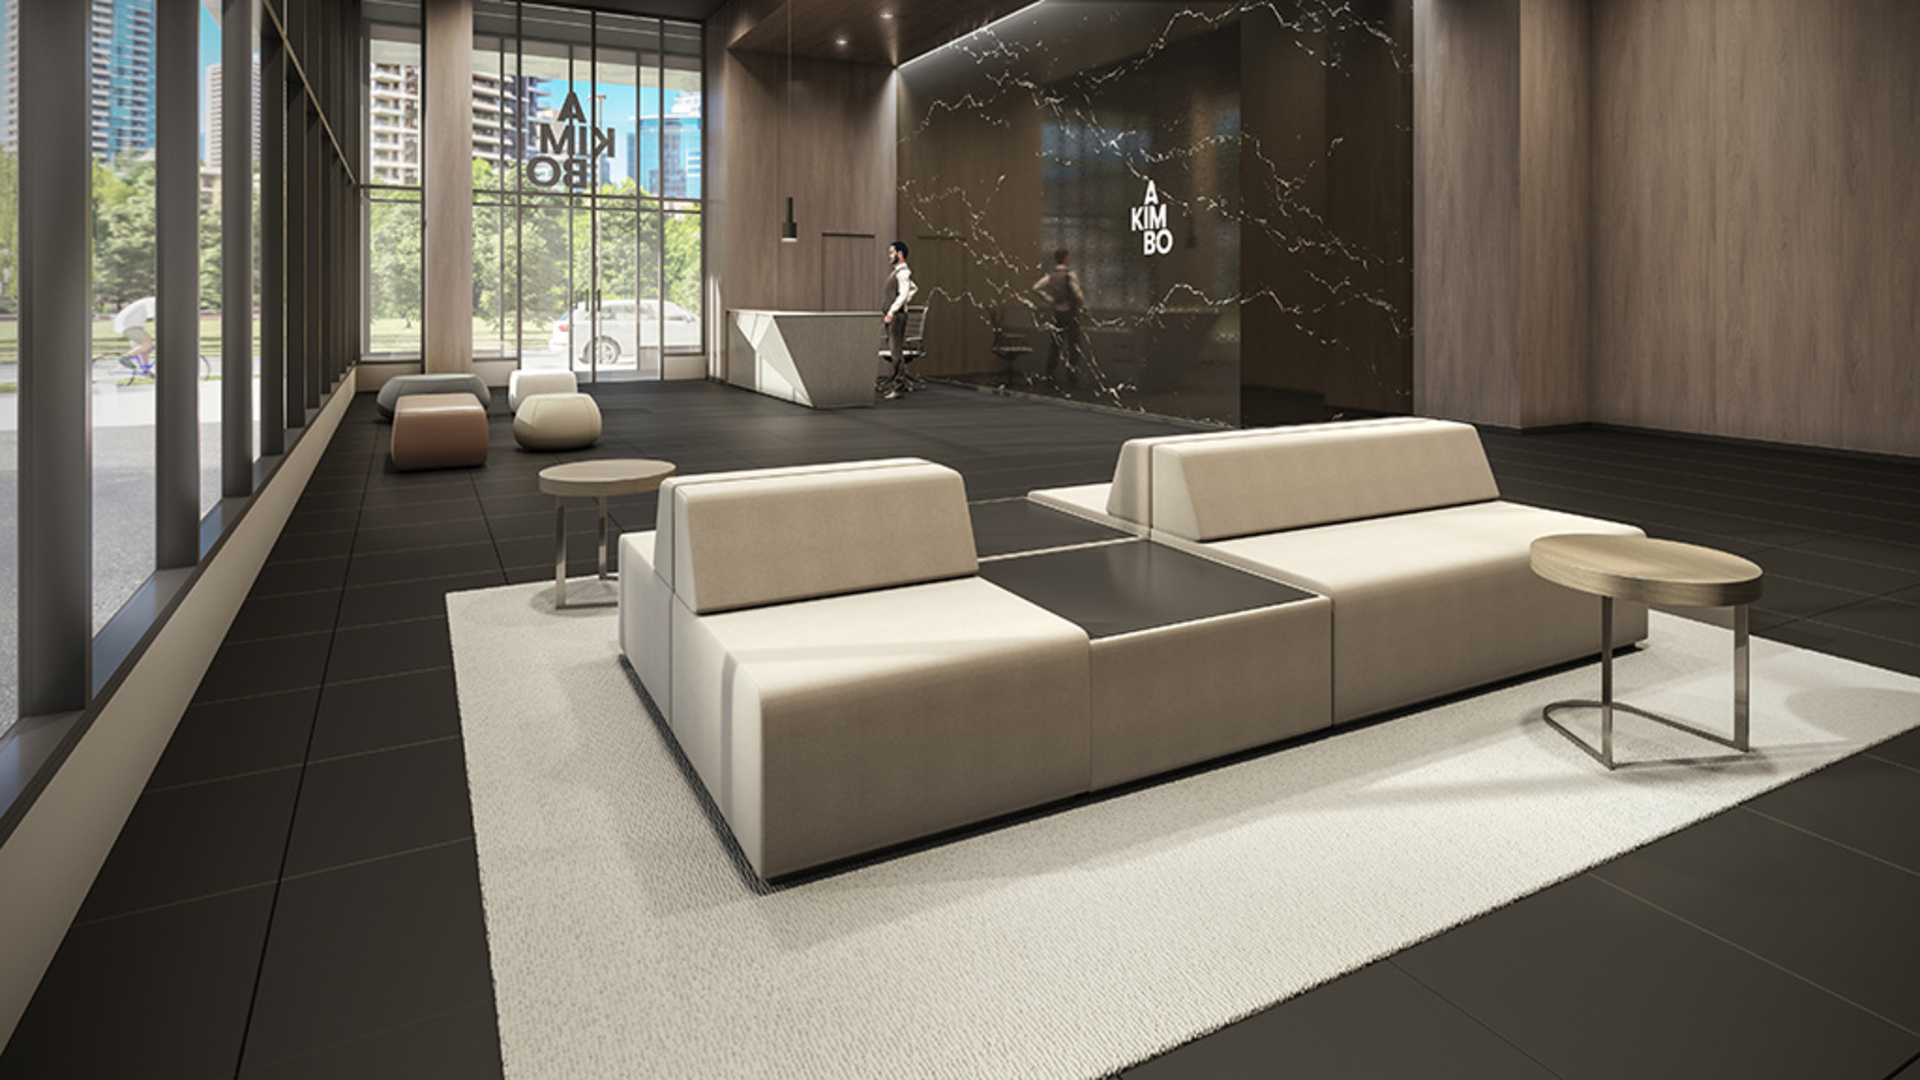 akimbo-interior-lobby at Akimbo (4285 Dawson Street, Brentwood Park, Burnaby North)